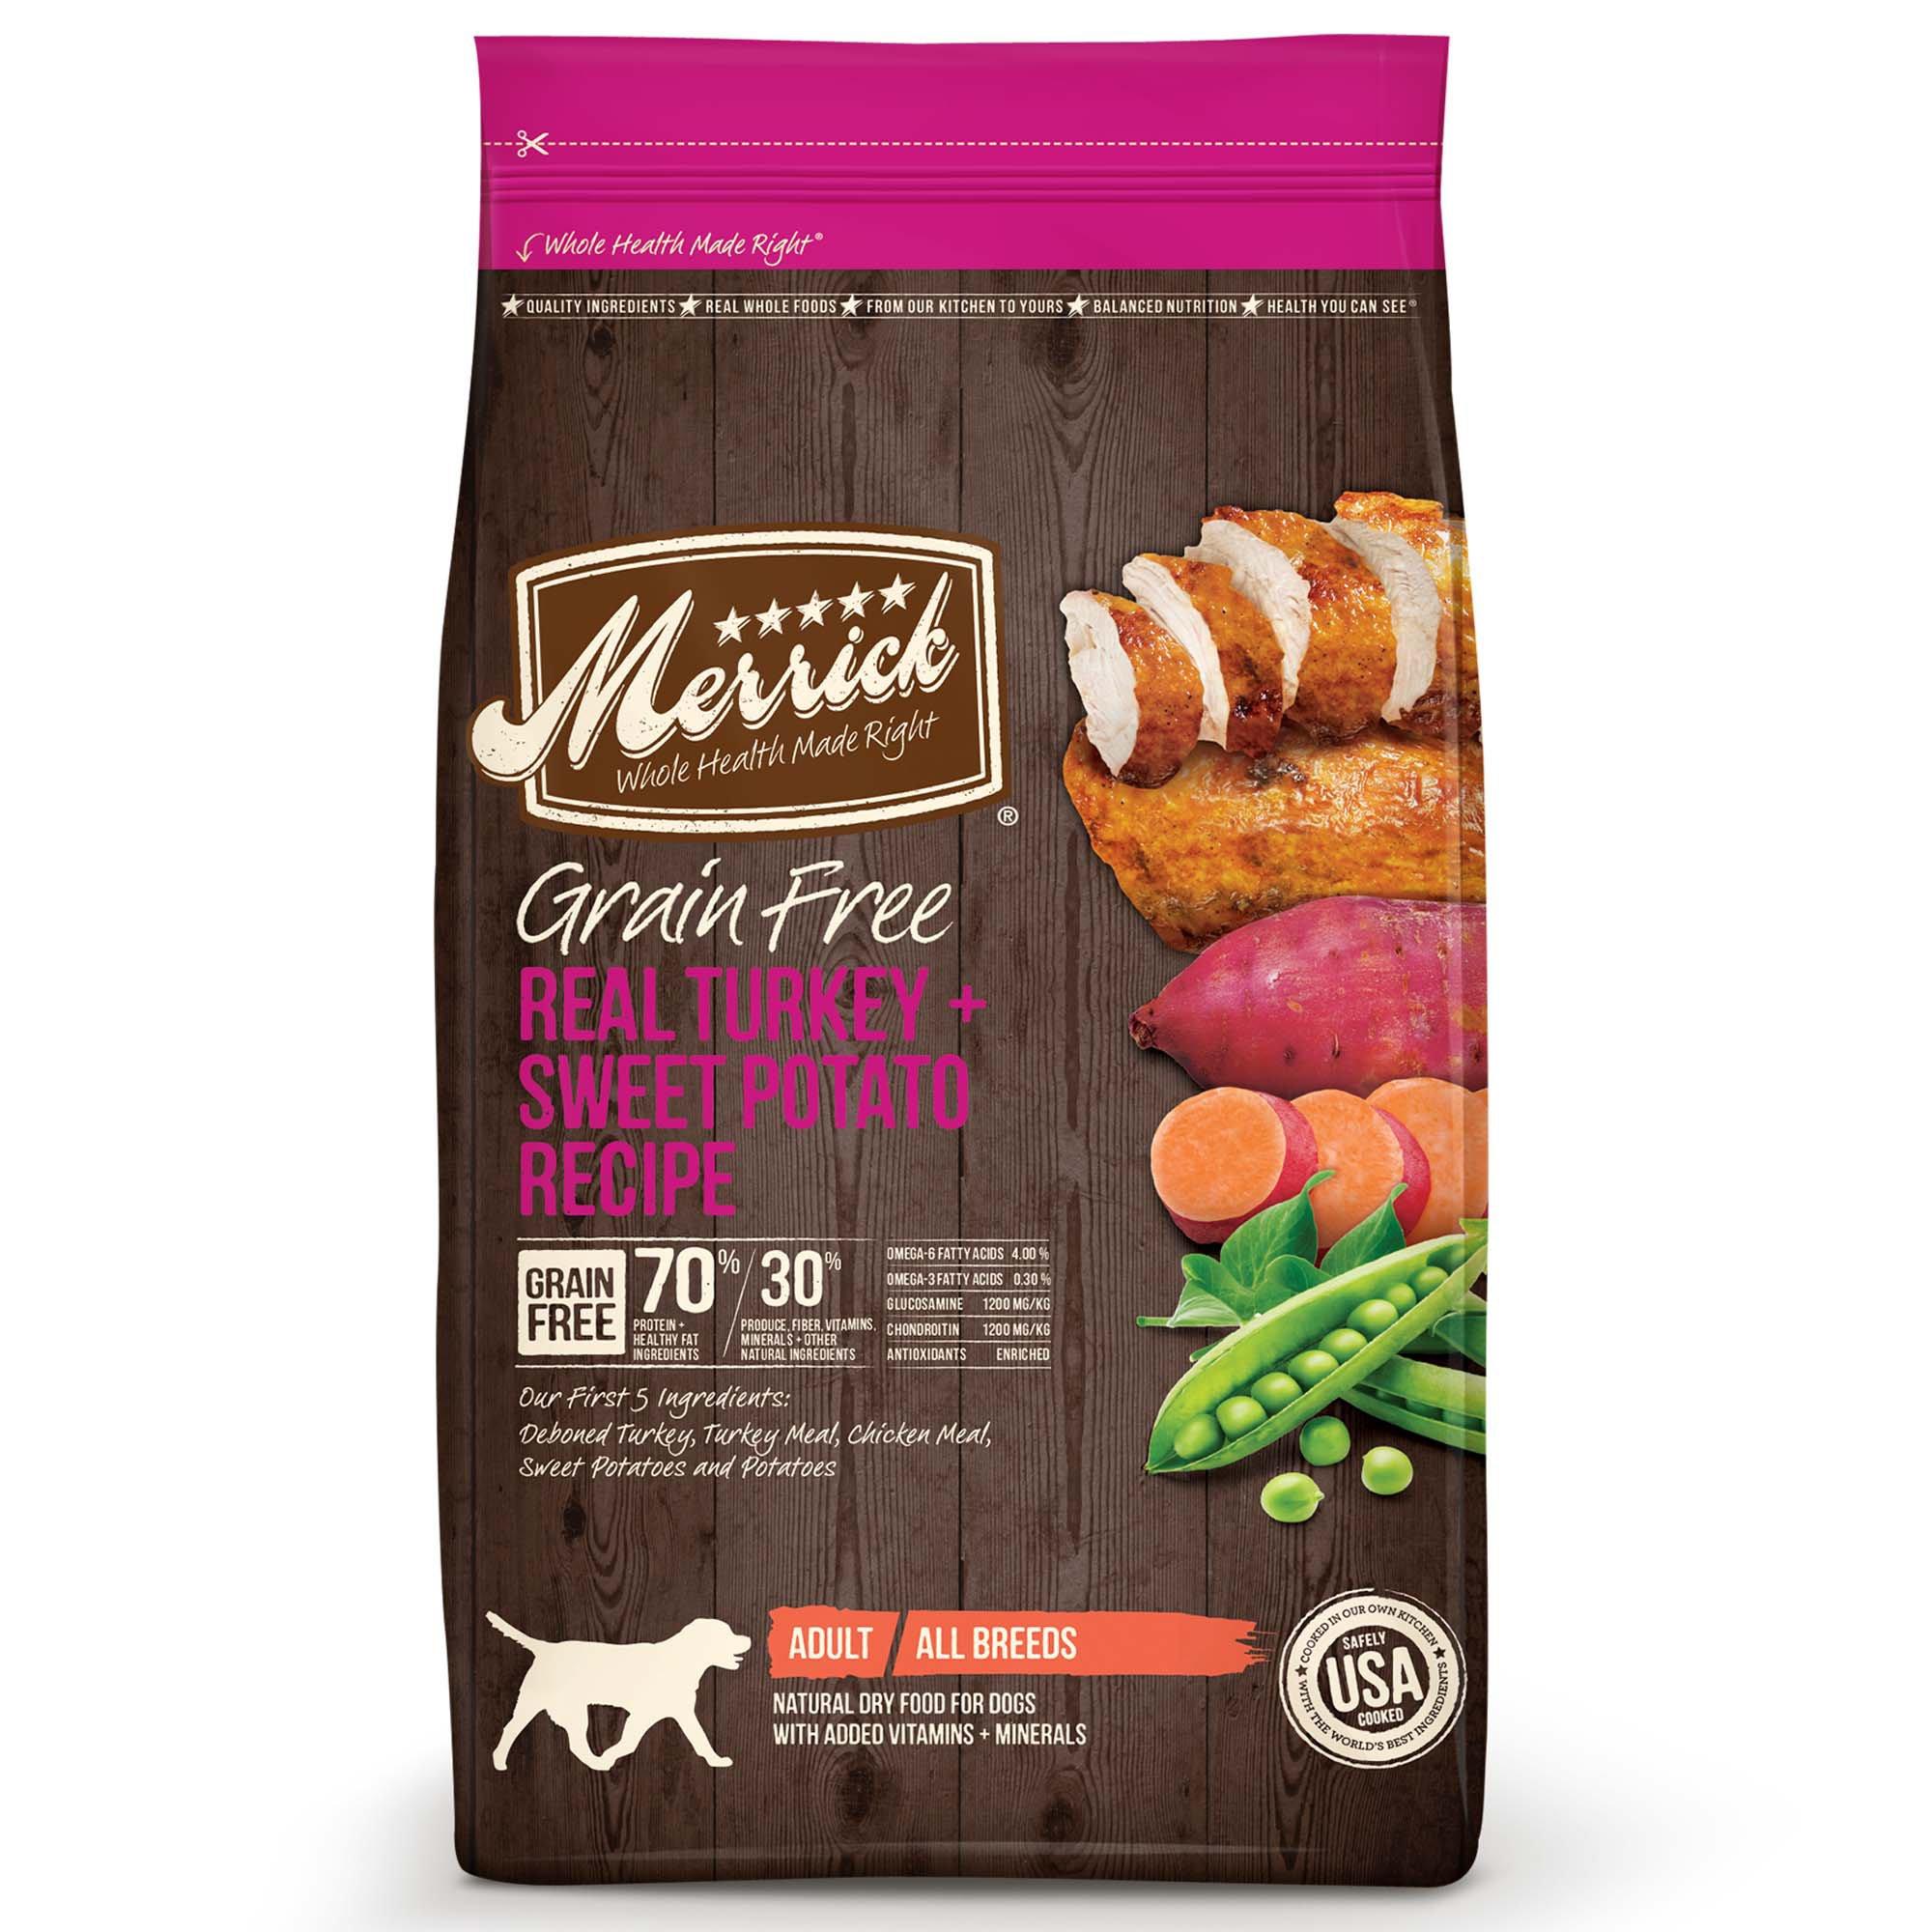 Grain Free Turkey And Sweet Potato Dog Food